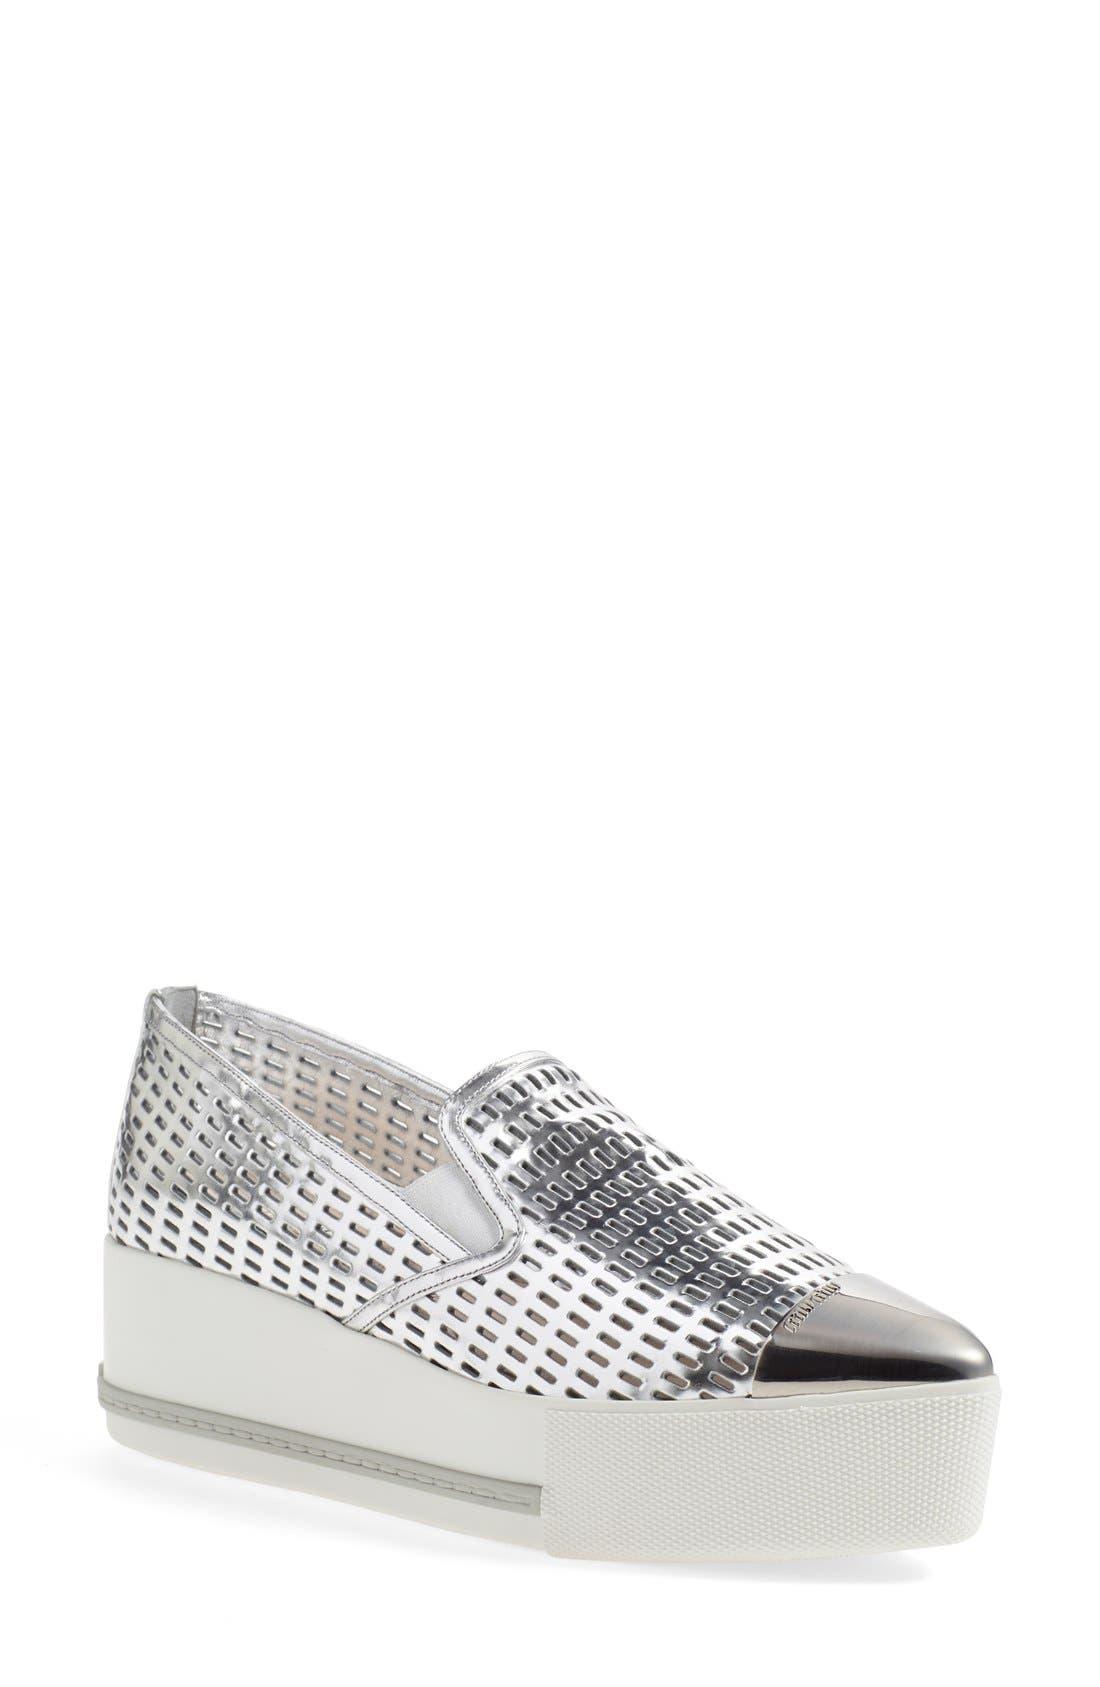 Alternate Image 1 Selected - Miu Miu 'Pantofole' Perforated Platform Sneaker (Women)